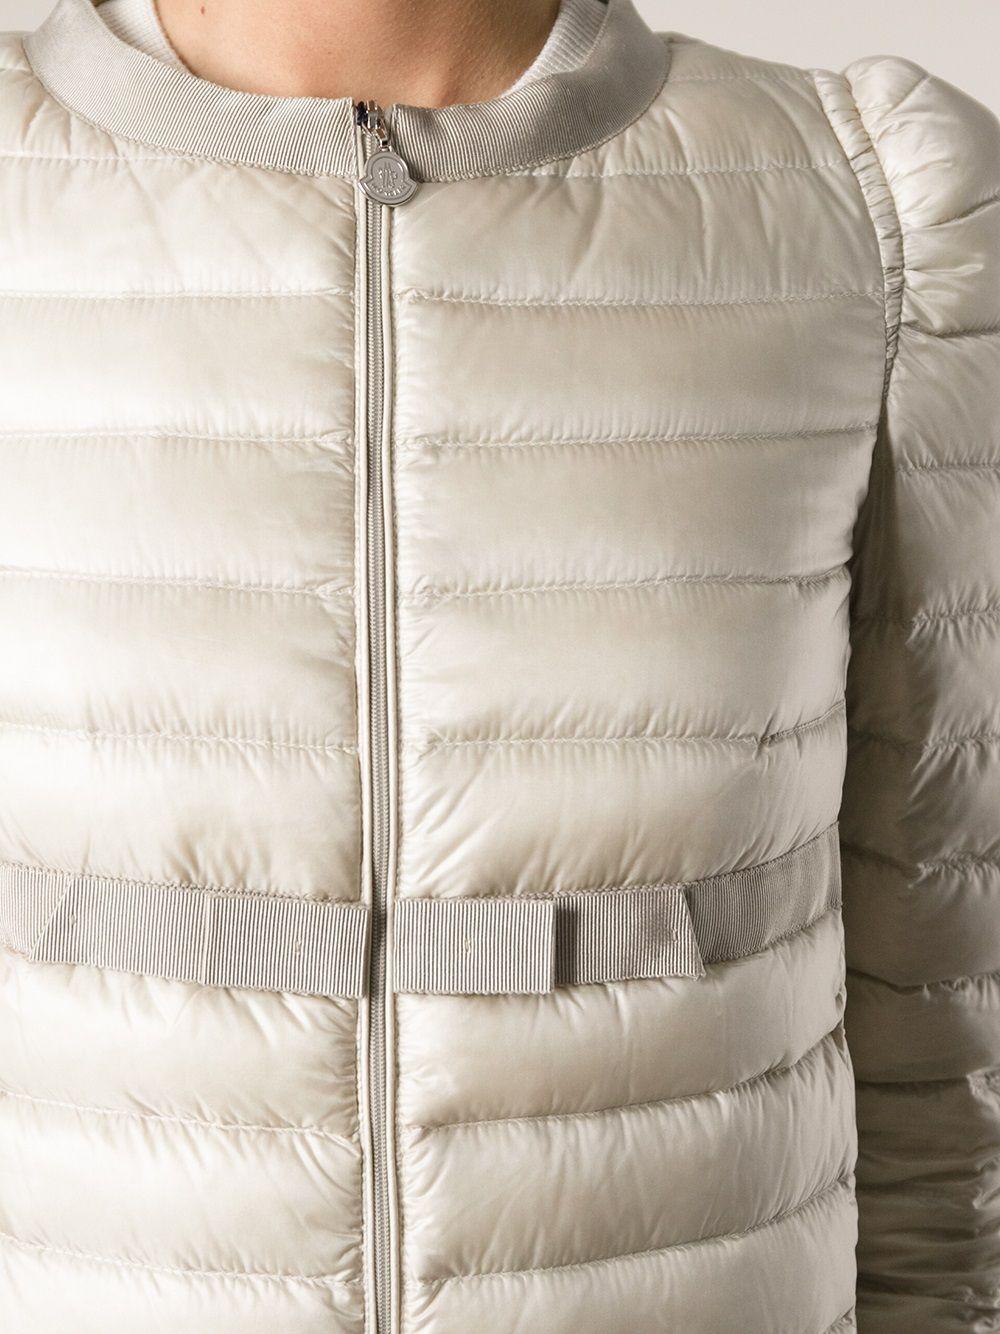 MONCLER - Ivory Dora padded jacket  #moncler #monclerjacket #womenjacket #jofré